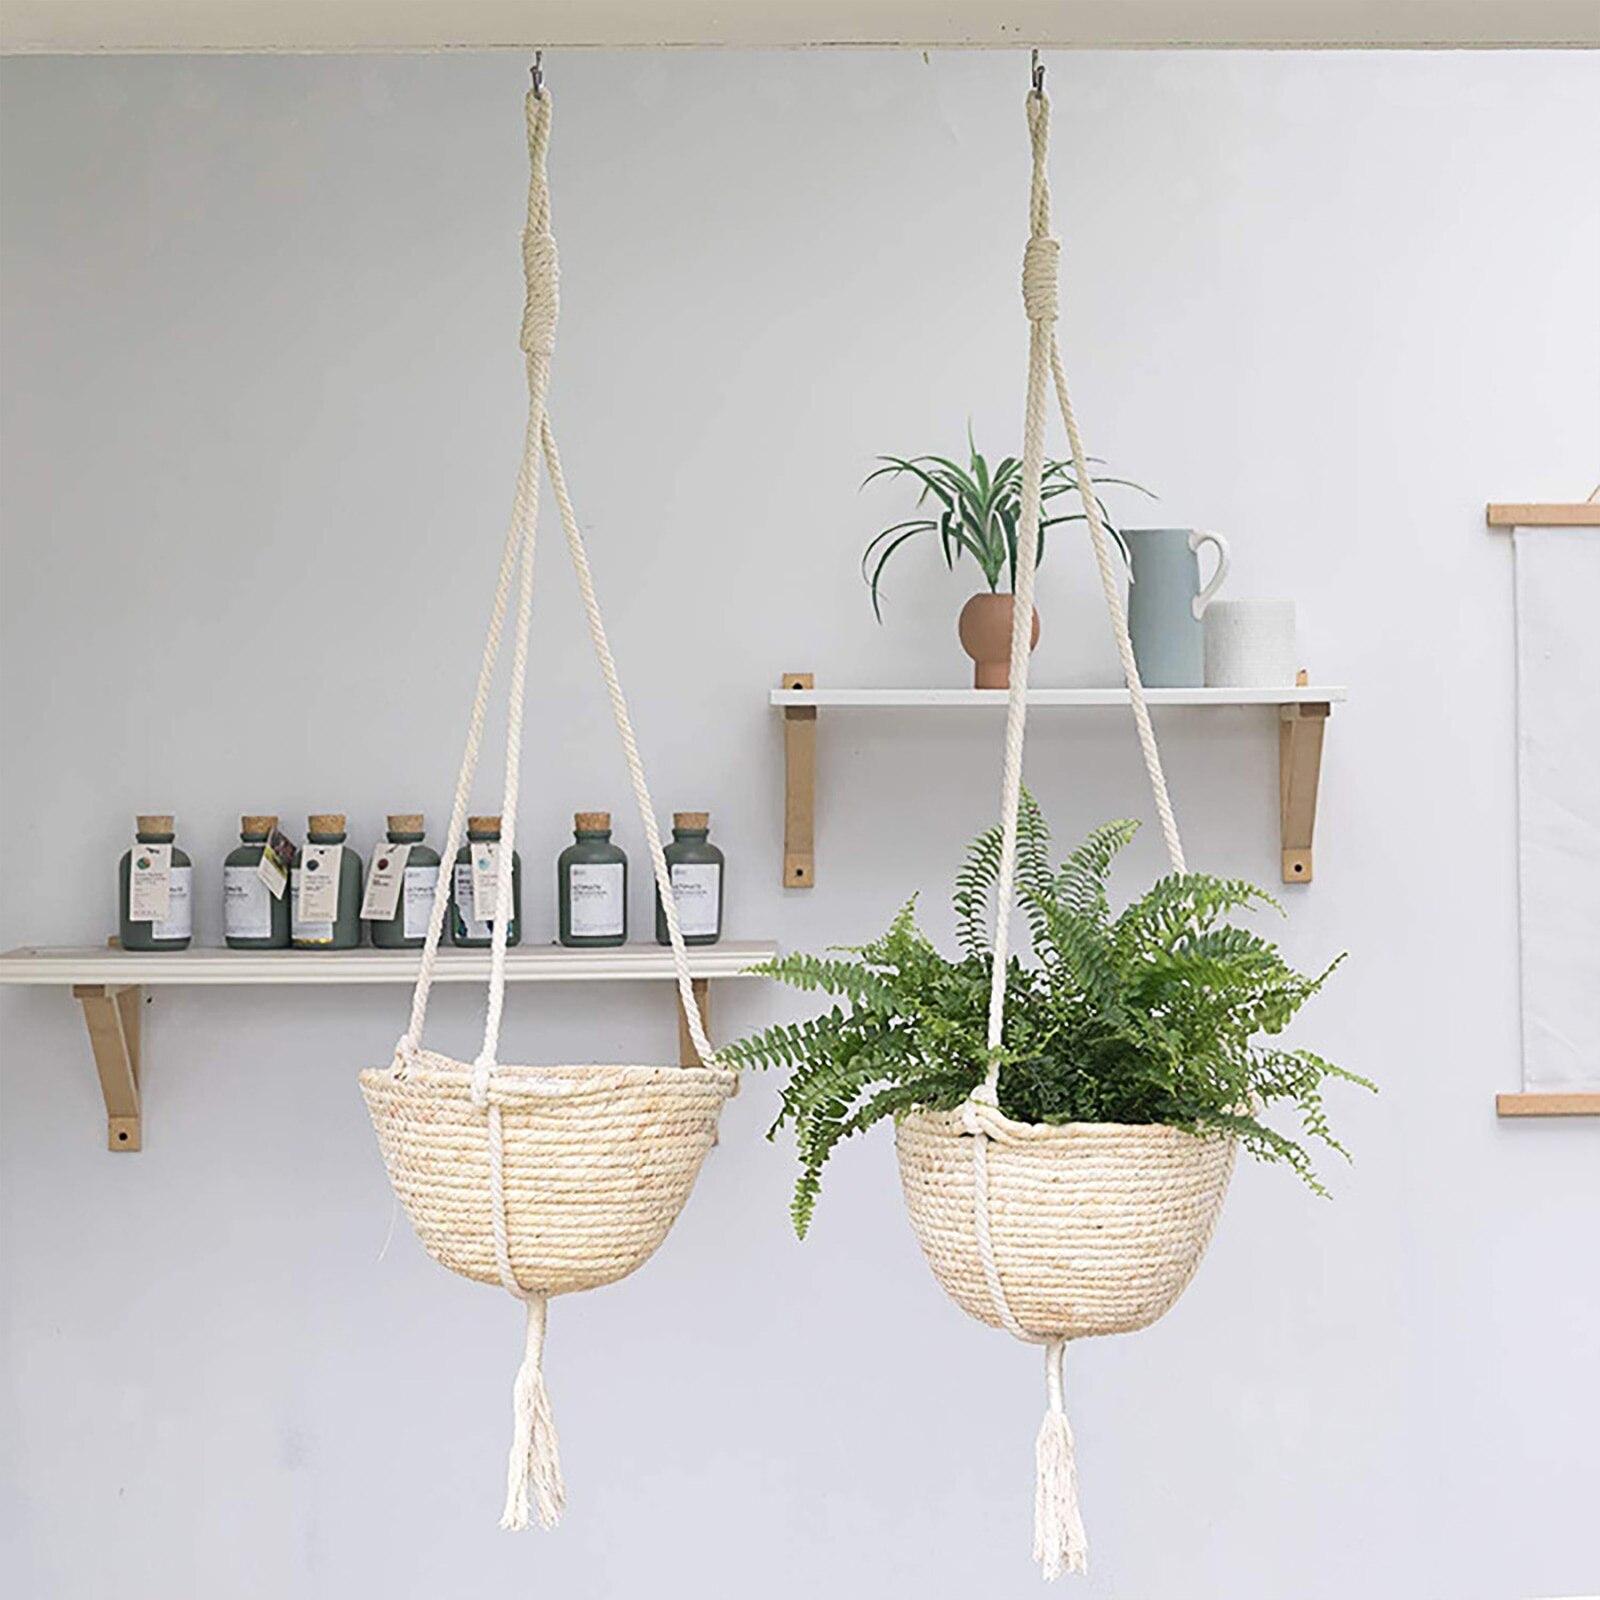 Garden Plant Hangers Jute Rope Hanging Planter Woven Hanging Planter Storage Basket Home Decorative Flower Pot Holder